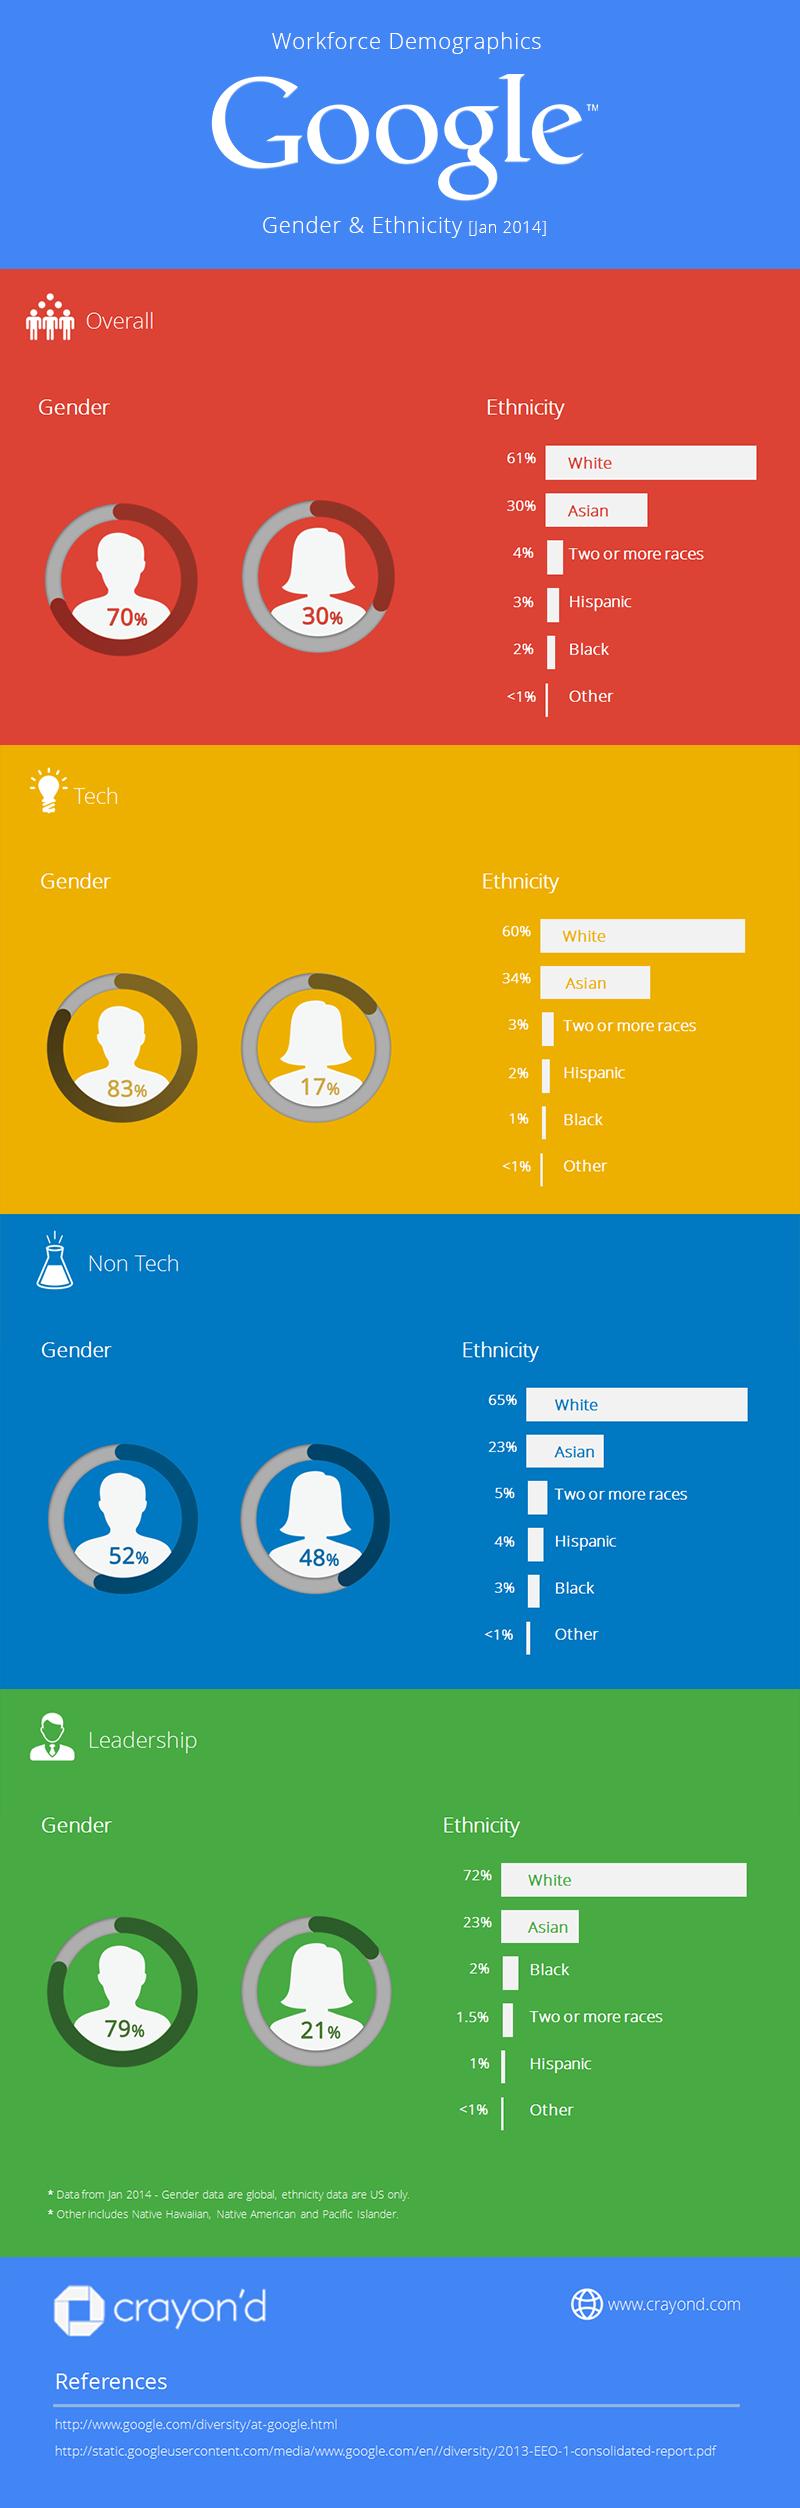 Google Diversity Report 2014